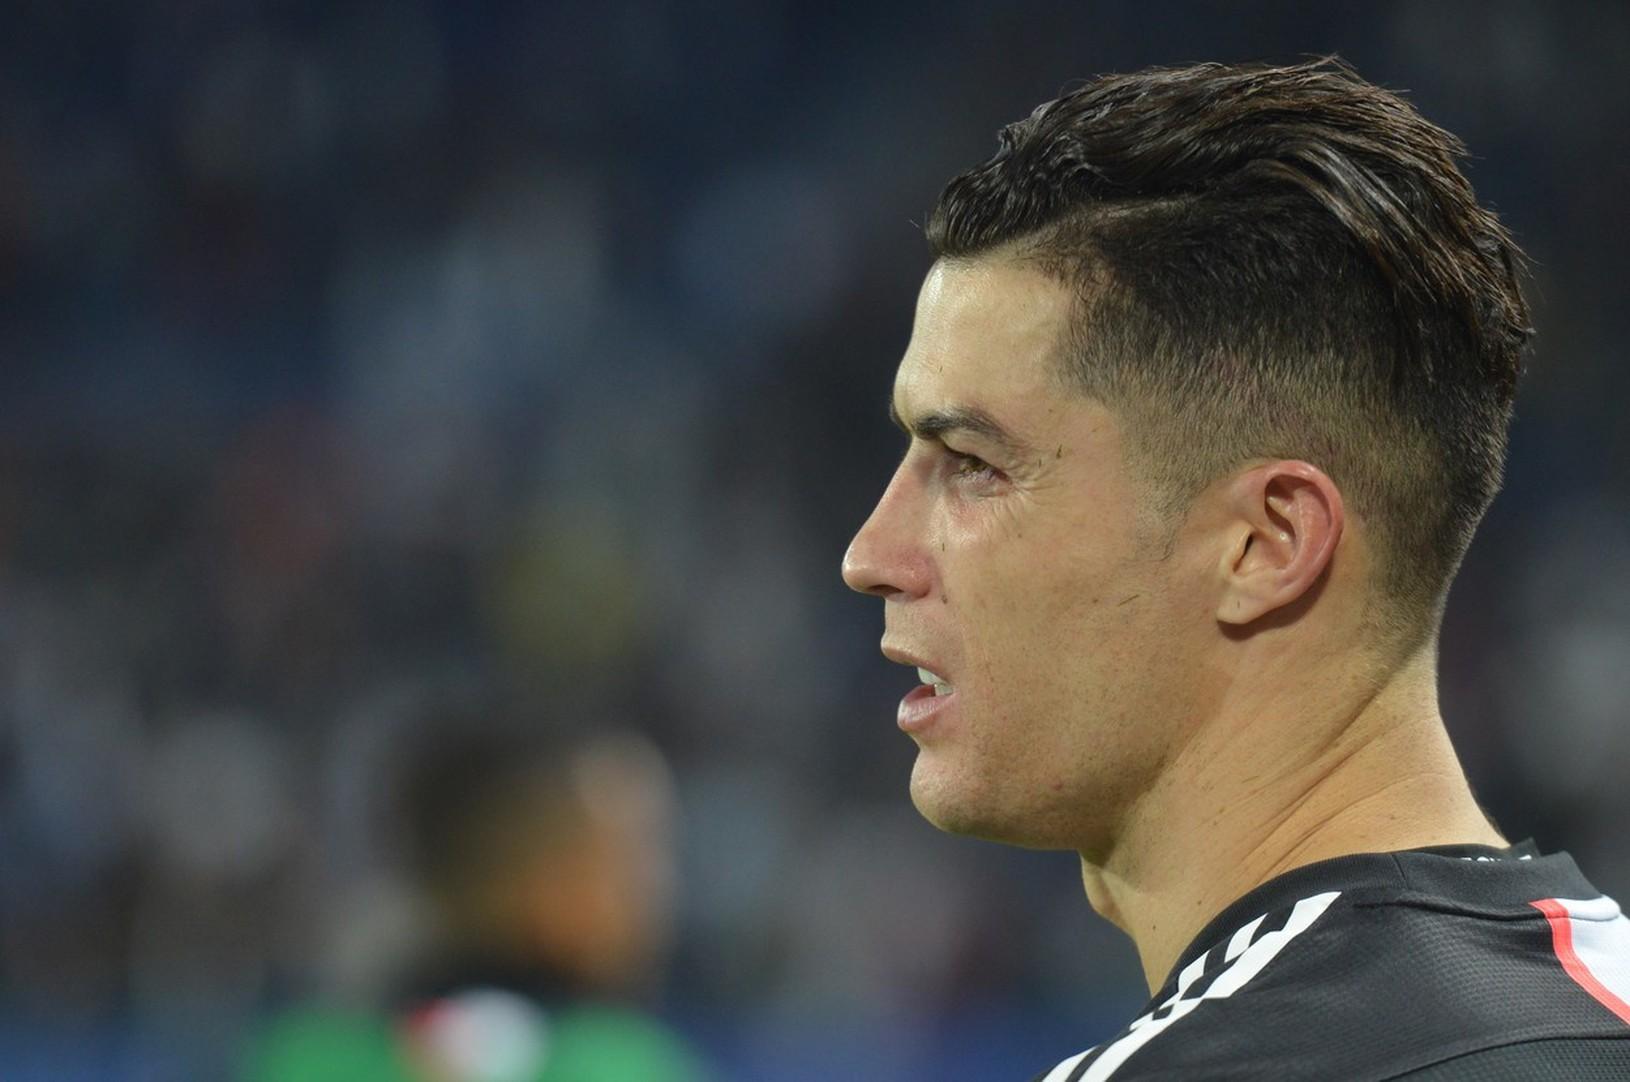 Frustrovaný Cristiano Ronaldo